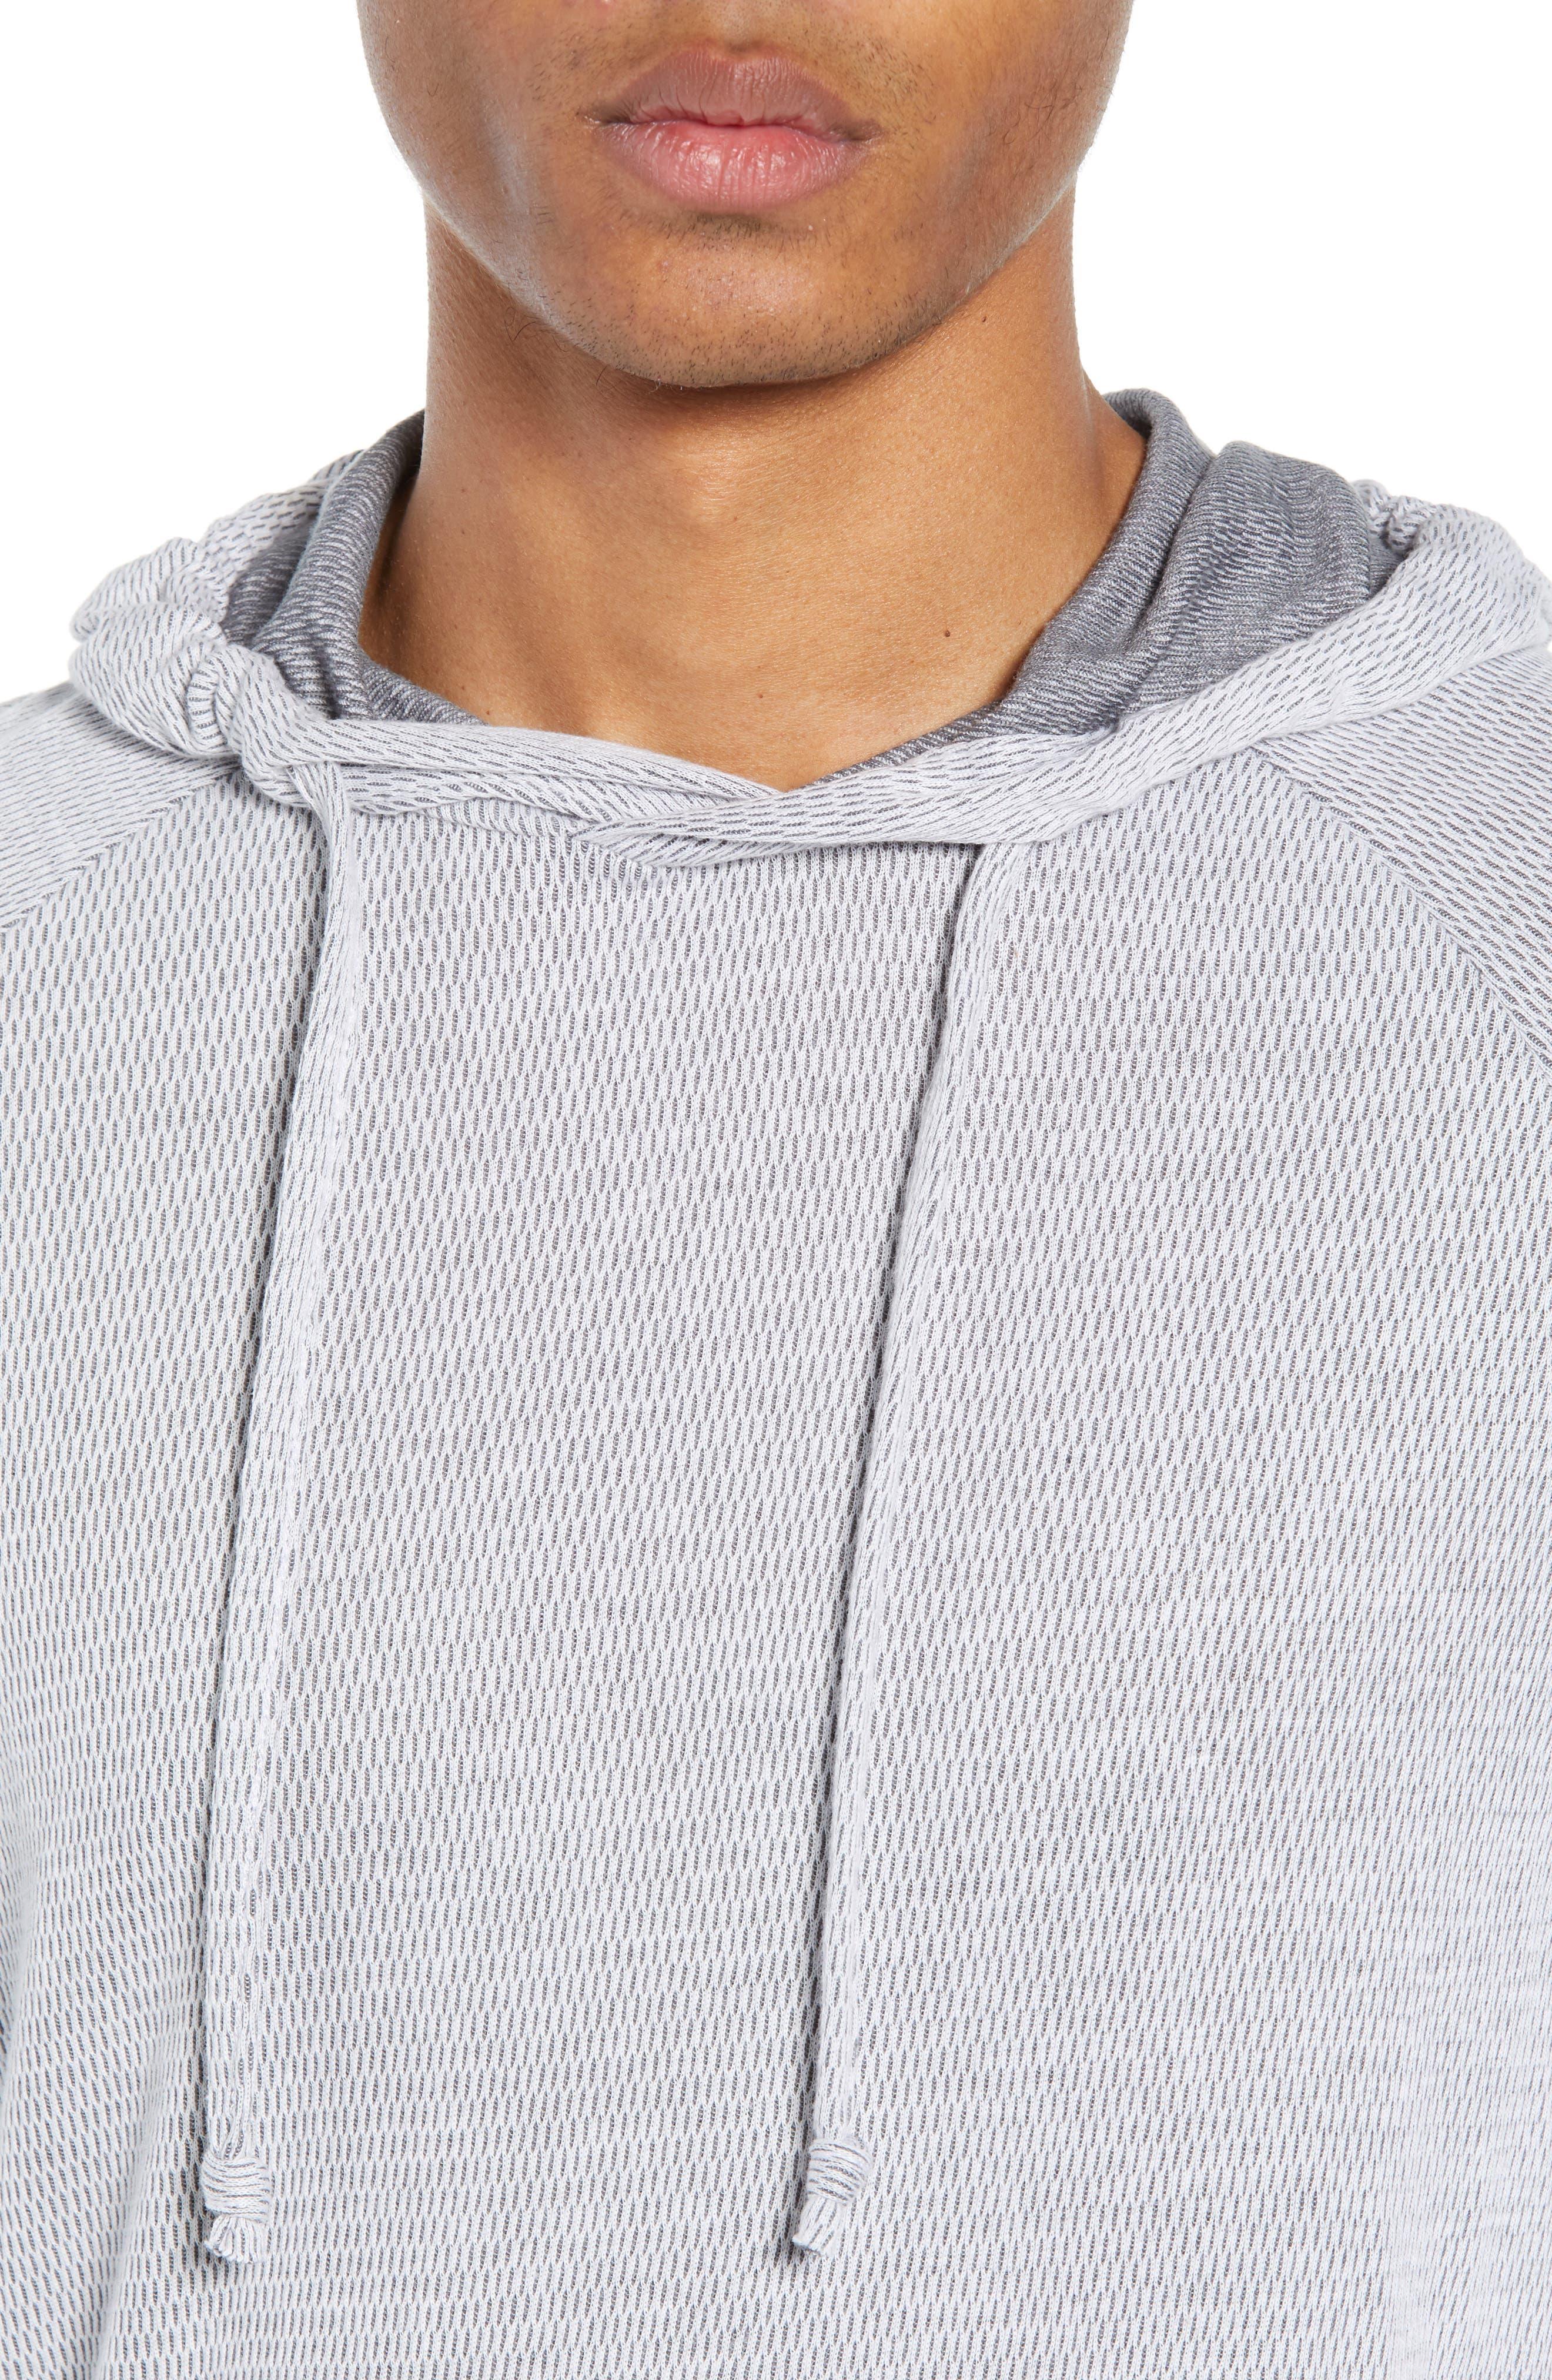 Thermal Knit Raglan Hoodie,                             Alternate thumbnail 4, color,                             GREY/ WHITE TWO TONE